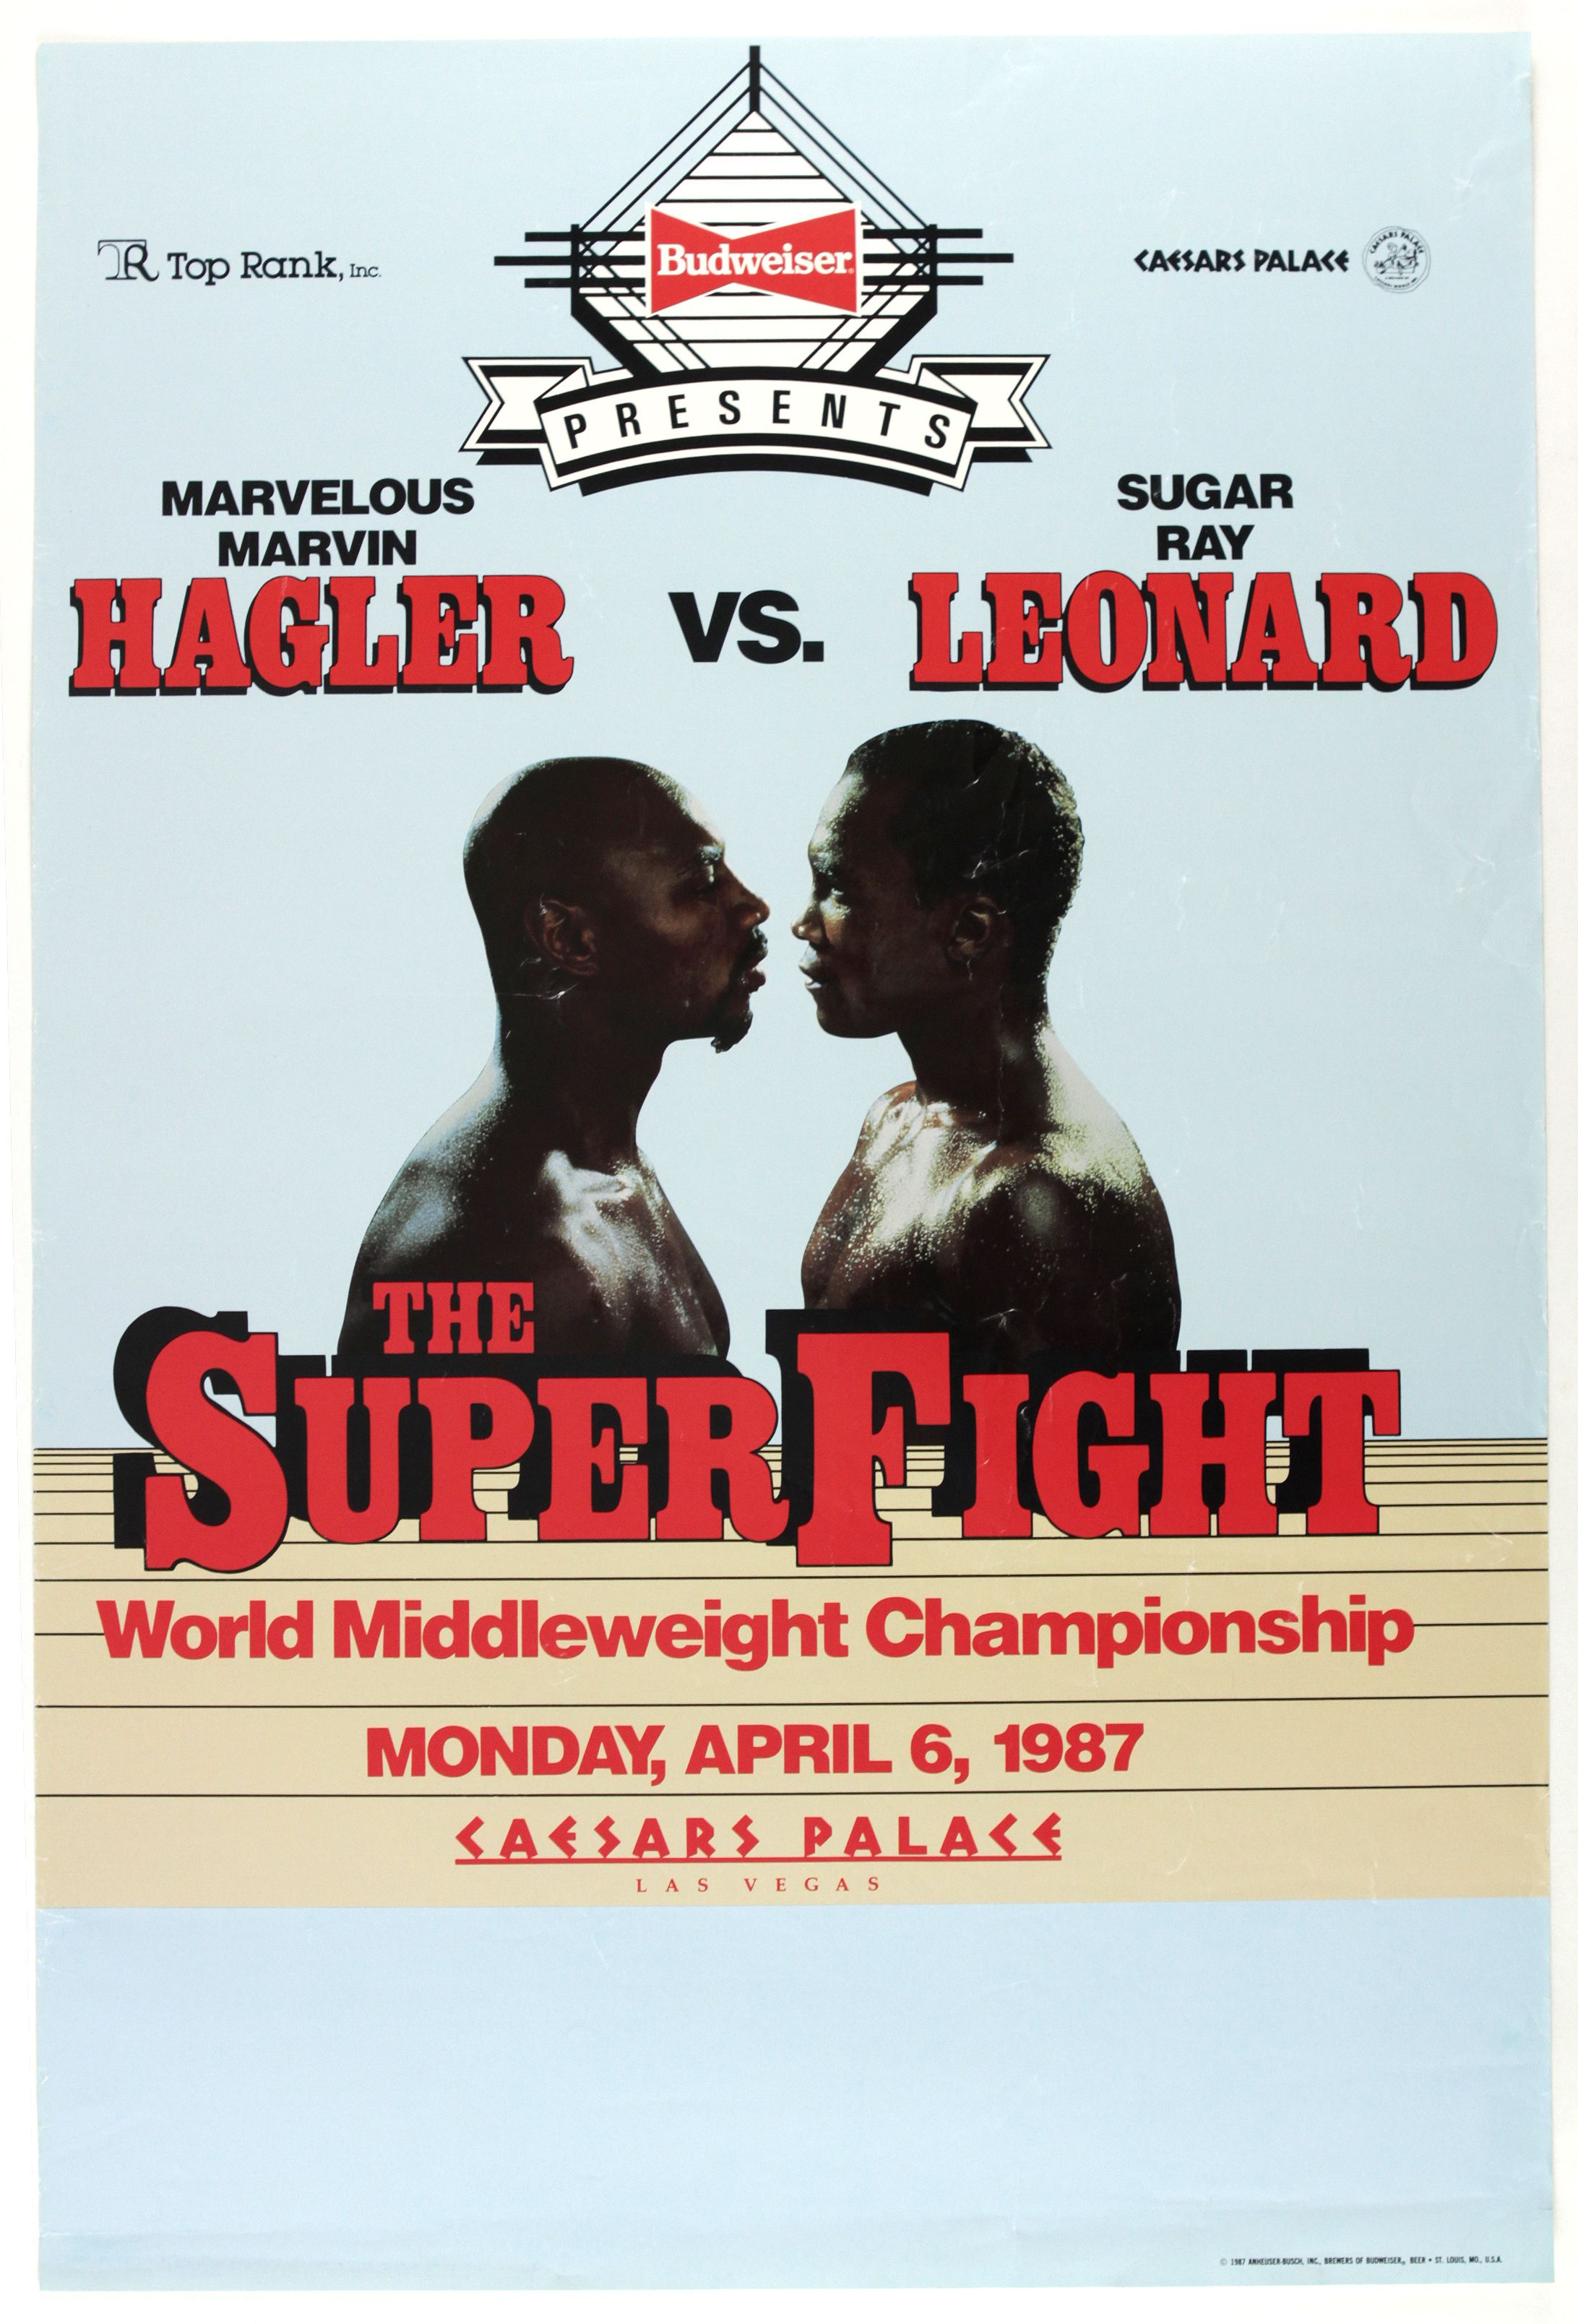 SUGAR RAY LEONARD MARVIN HAGLER Poster Boxing Poster 36 x 24 A